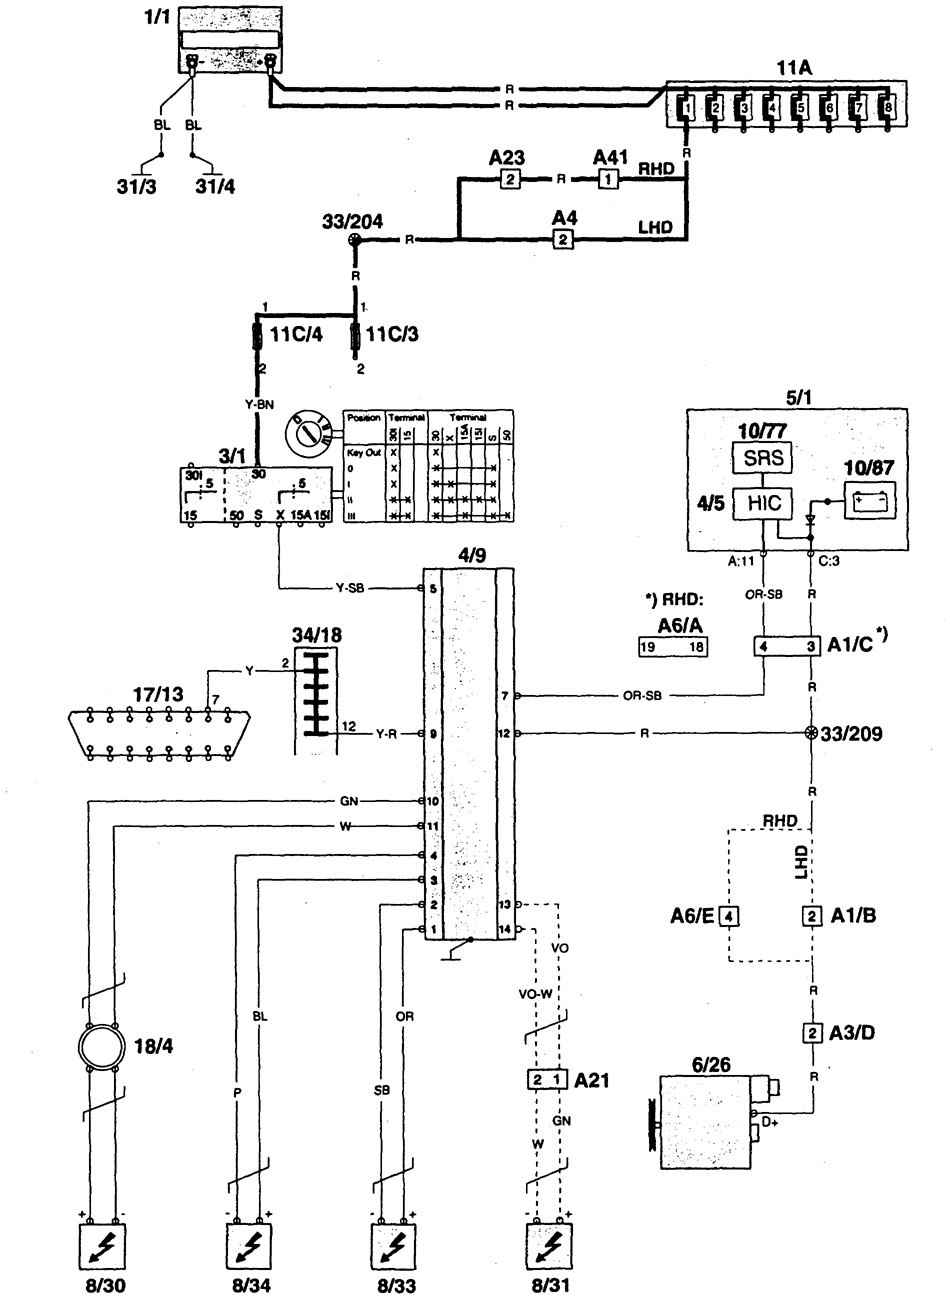 1997 Volvo 960 Wiring Diagram 2005 Mercury Mountaineer ... on volvo parts diagram, volvo repair diagrams, volvo fuel pump wiring diagram, volvo 850 wiring diagram, volvo s70 wiring diagram, volvo 960 repair, volvo s80 headlight diagram, volvo 240 wiring diagram, volvo s60 wiring diagram, volvo 960 thermostat replacement, volvo v70 wiring diagram, volvo 960 body diagram, volvo s40 wiring diagram, volvo c70 wiring diagram, volvo 960 radio, volvo s80 wiring diagram, volvo 960 engine swap, volvo 940 wiring diagram, volvo engine diagram, volvo amazon wiring diagram,